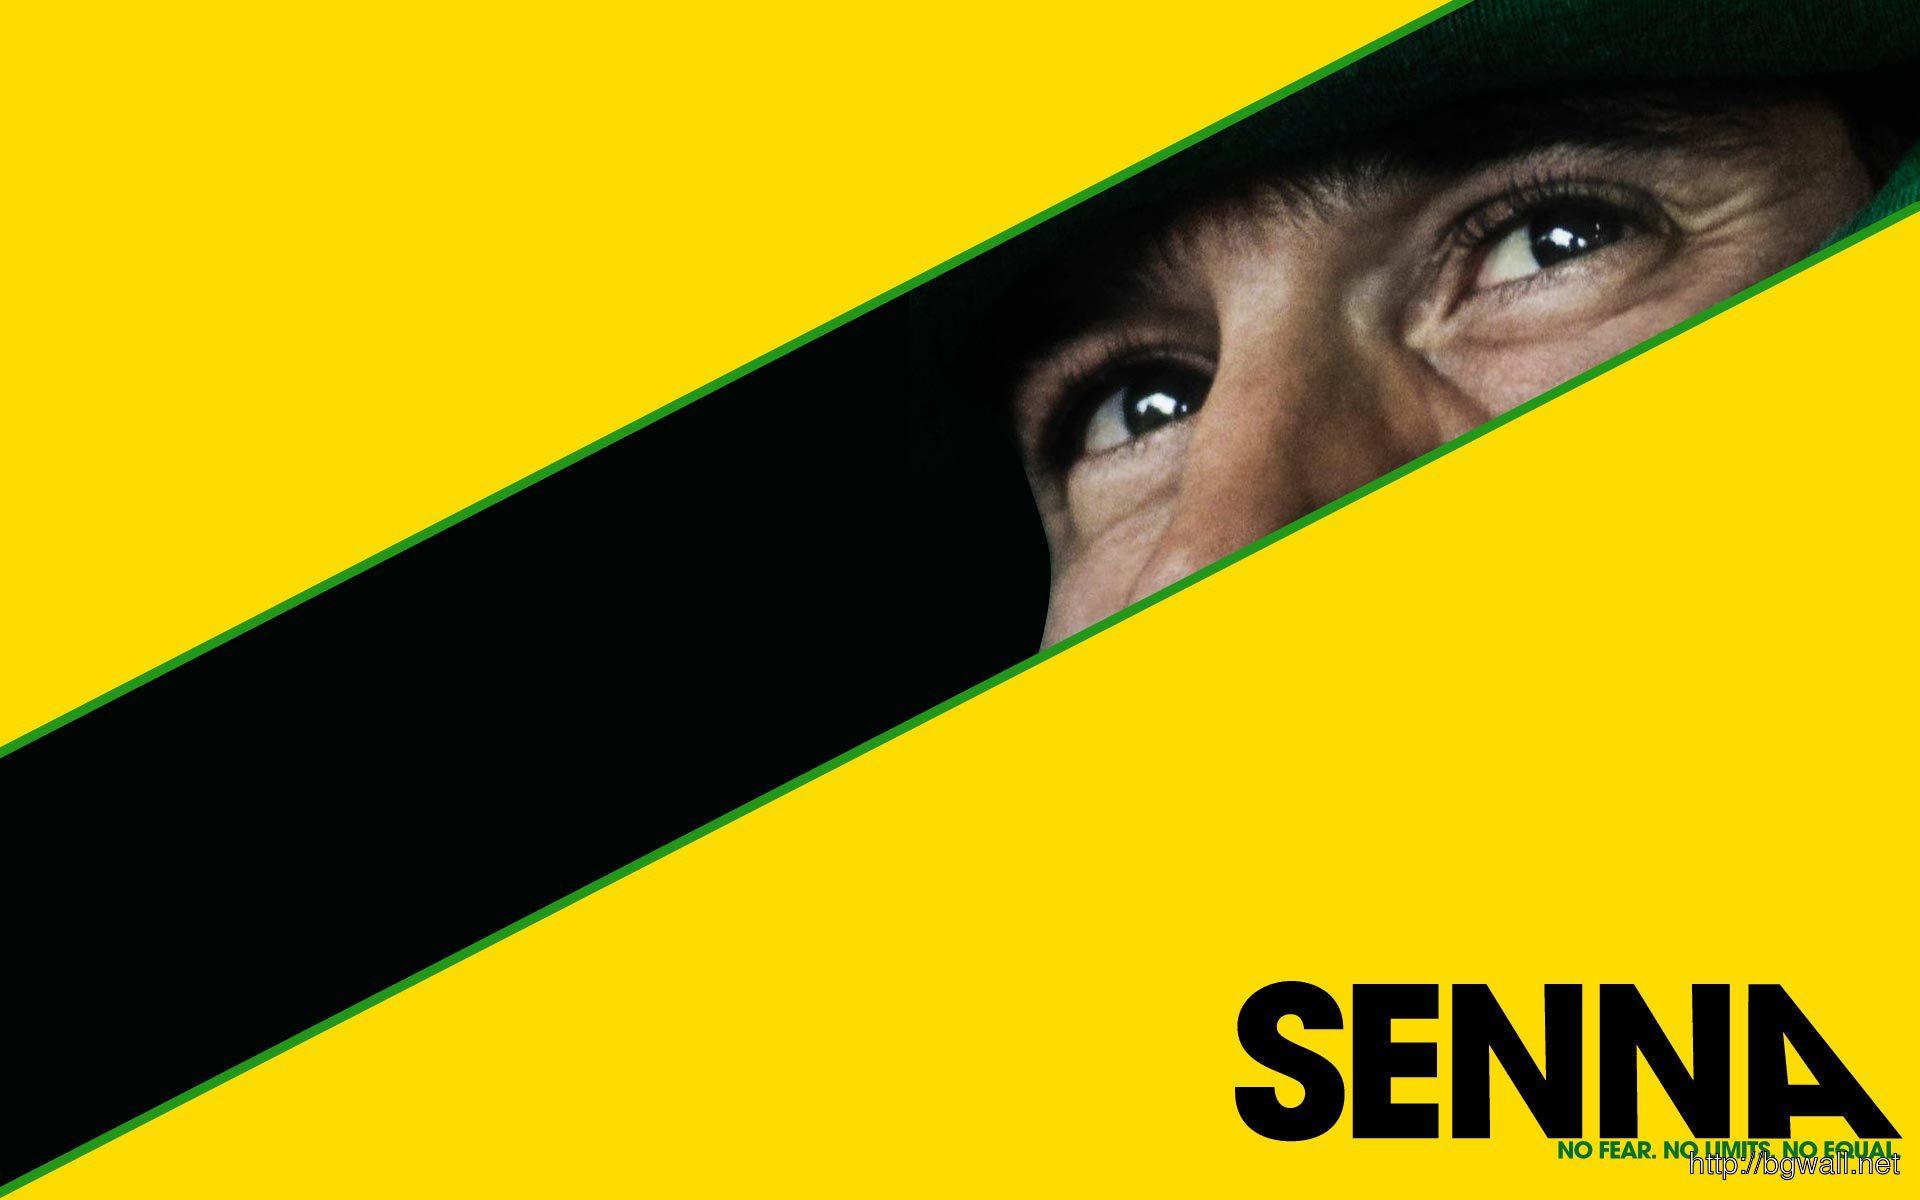 Ayrton Senna Movie Background Wallpaper Hd